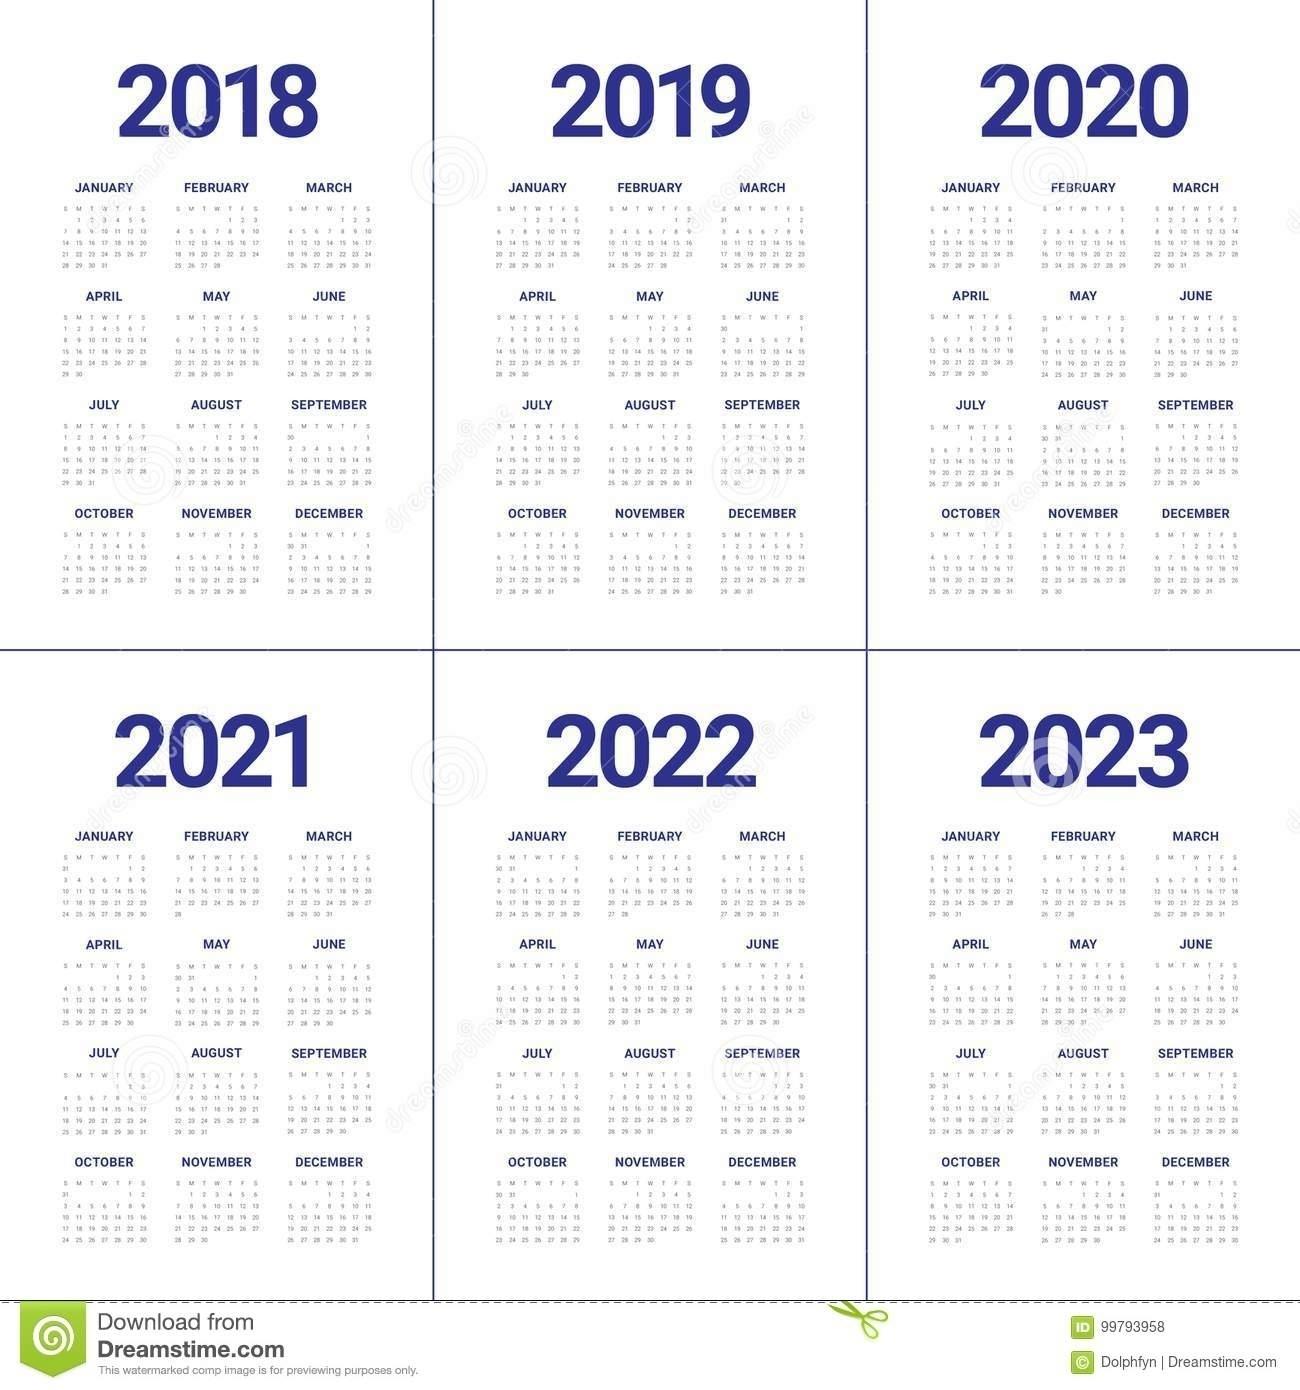 Three Year Printable Calendar 2021 To 2023 | Calendar